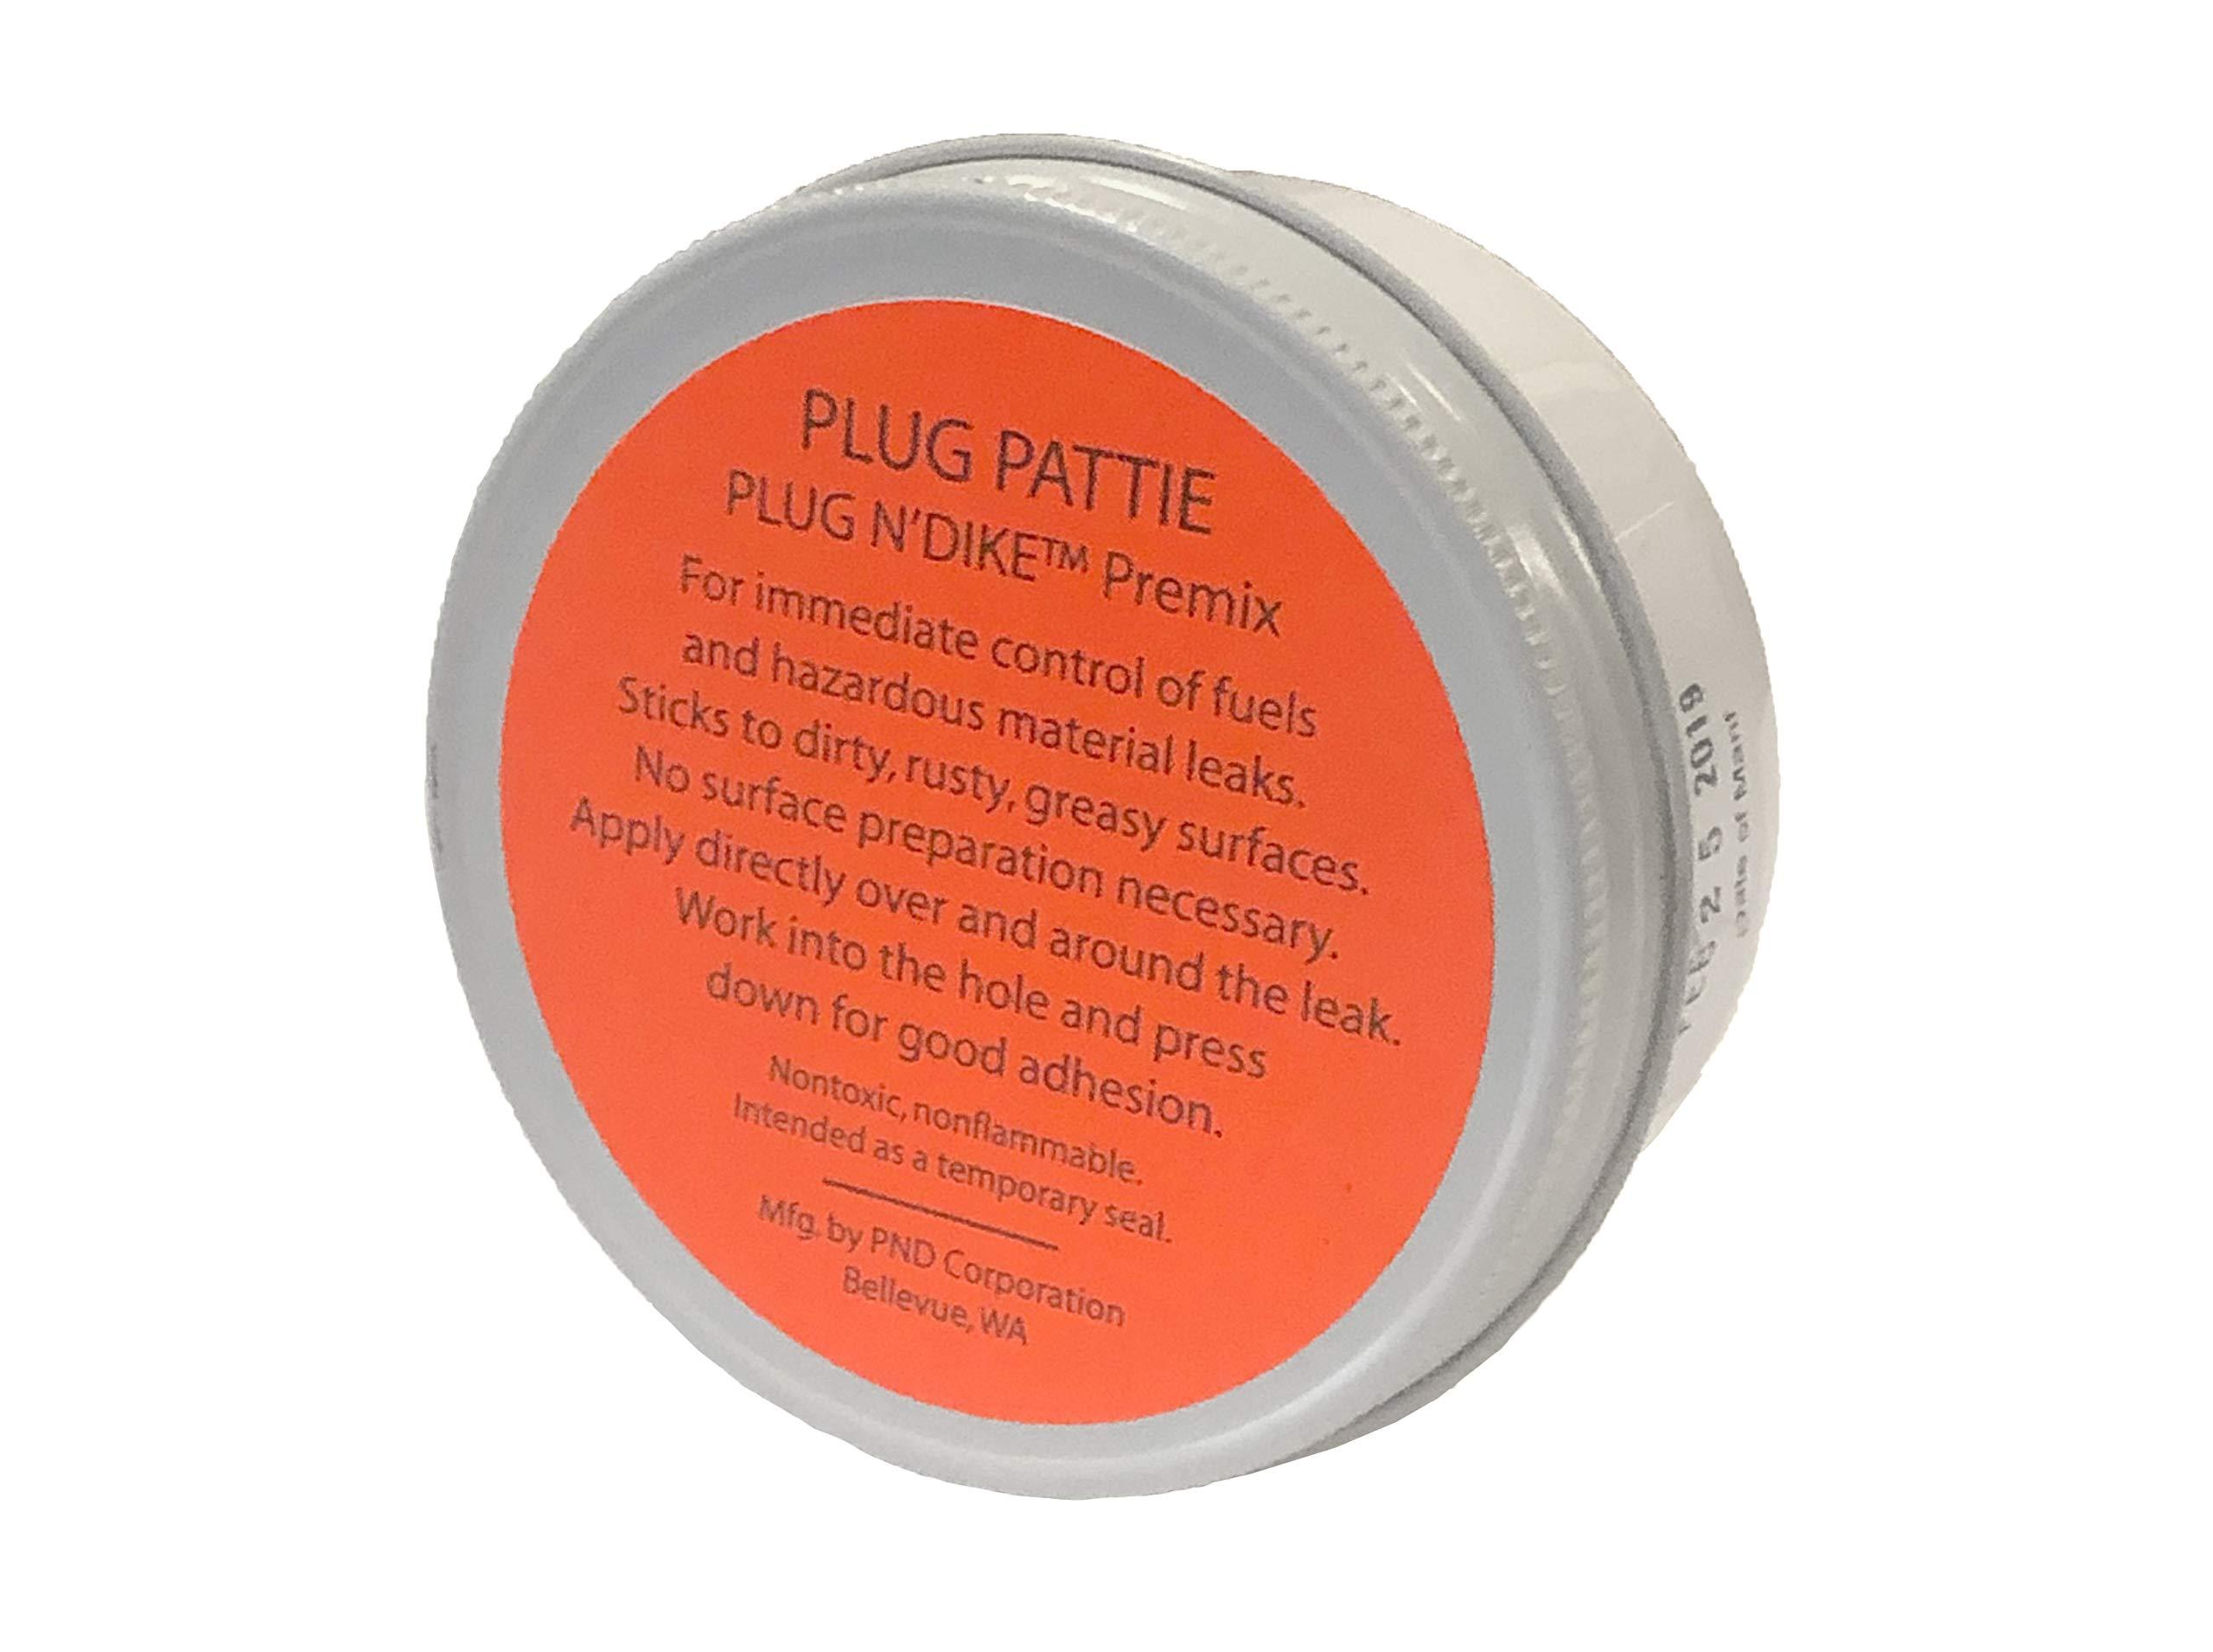 Plug 'n Dike Premix Pattie (Case of 4)